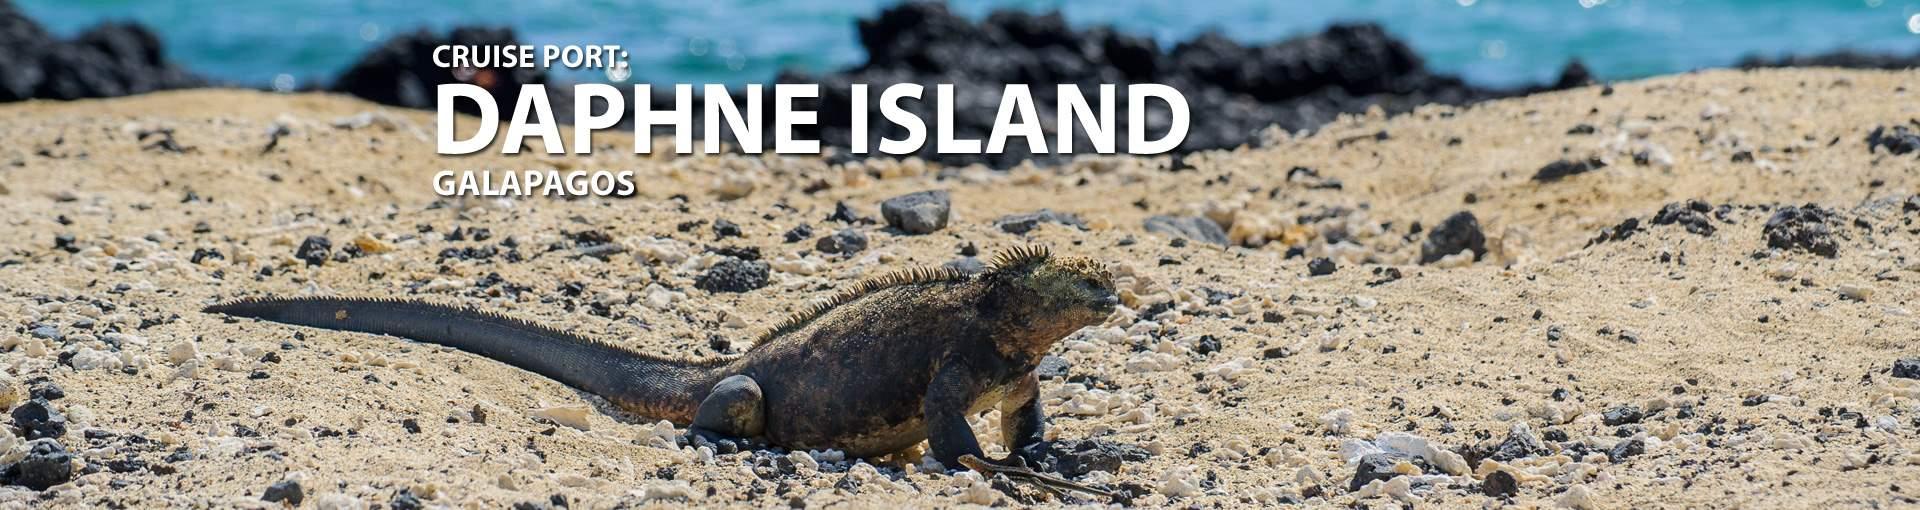 Cruises to Daphne Island Galapagos